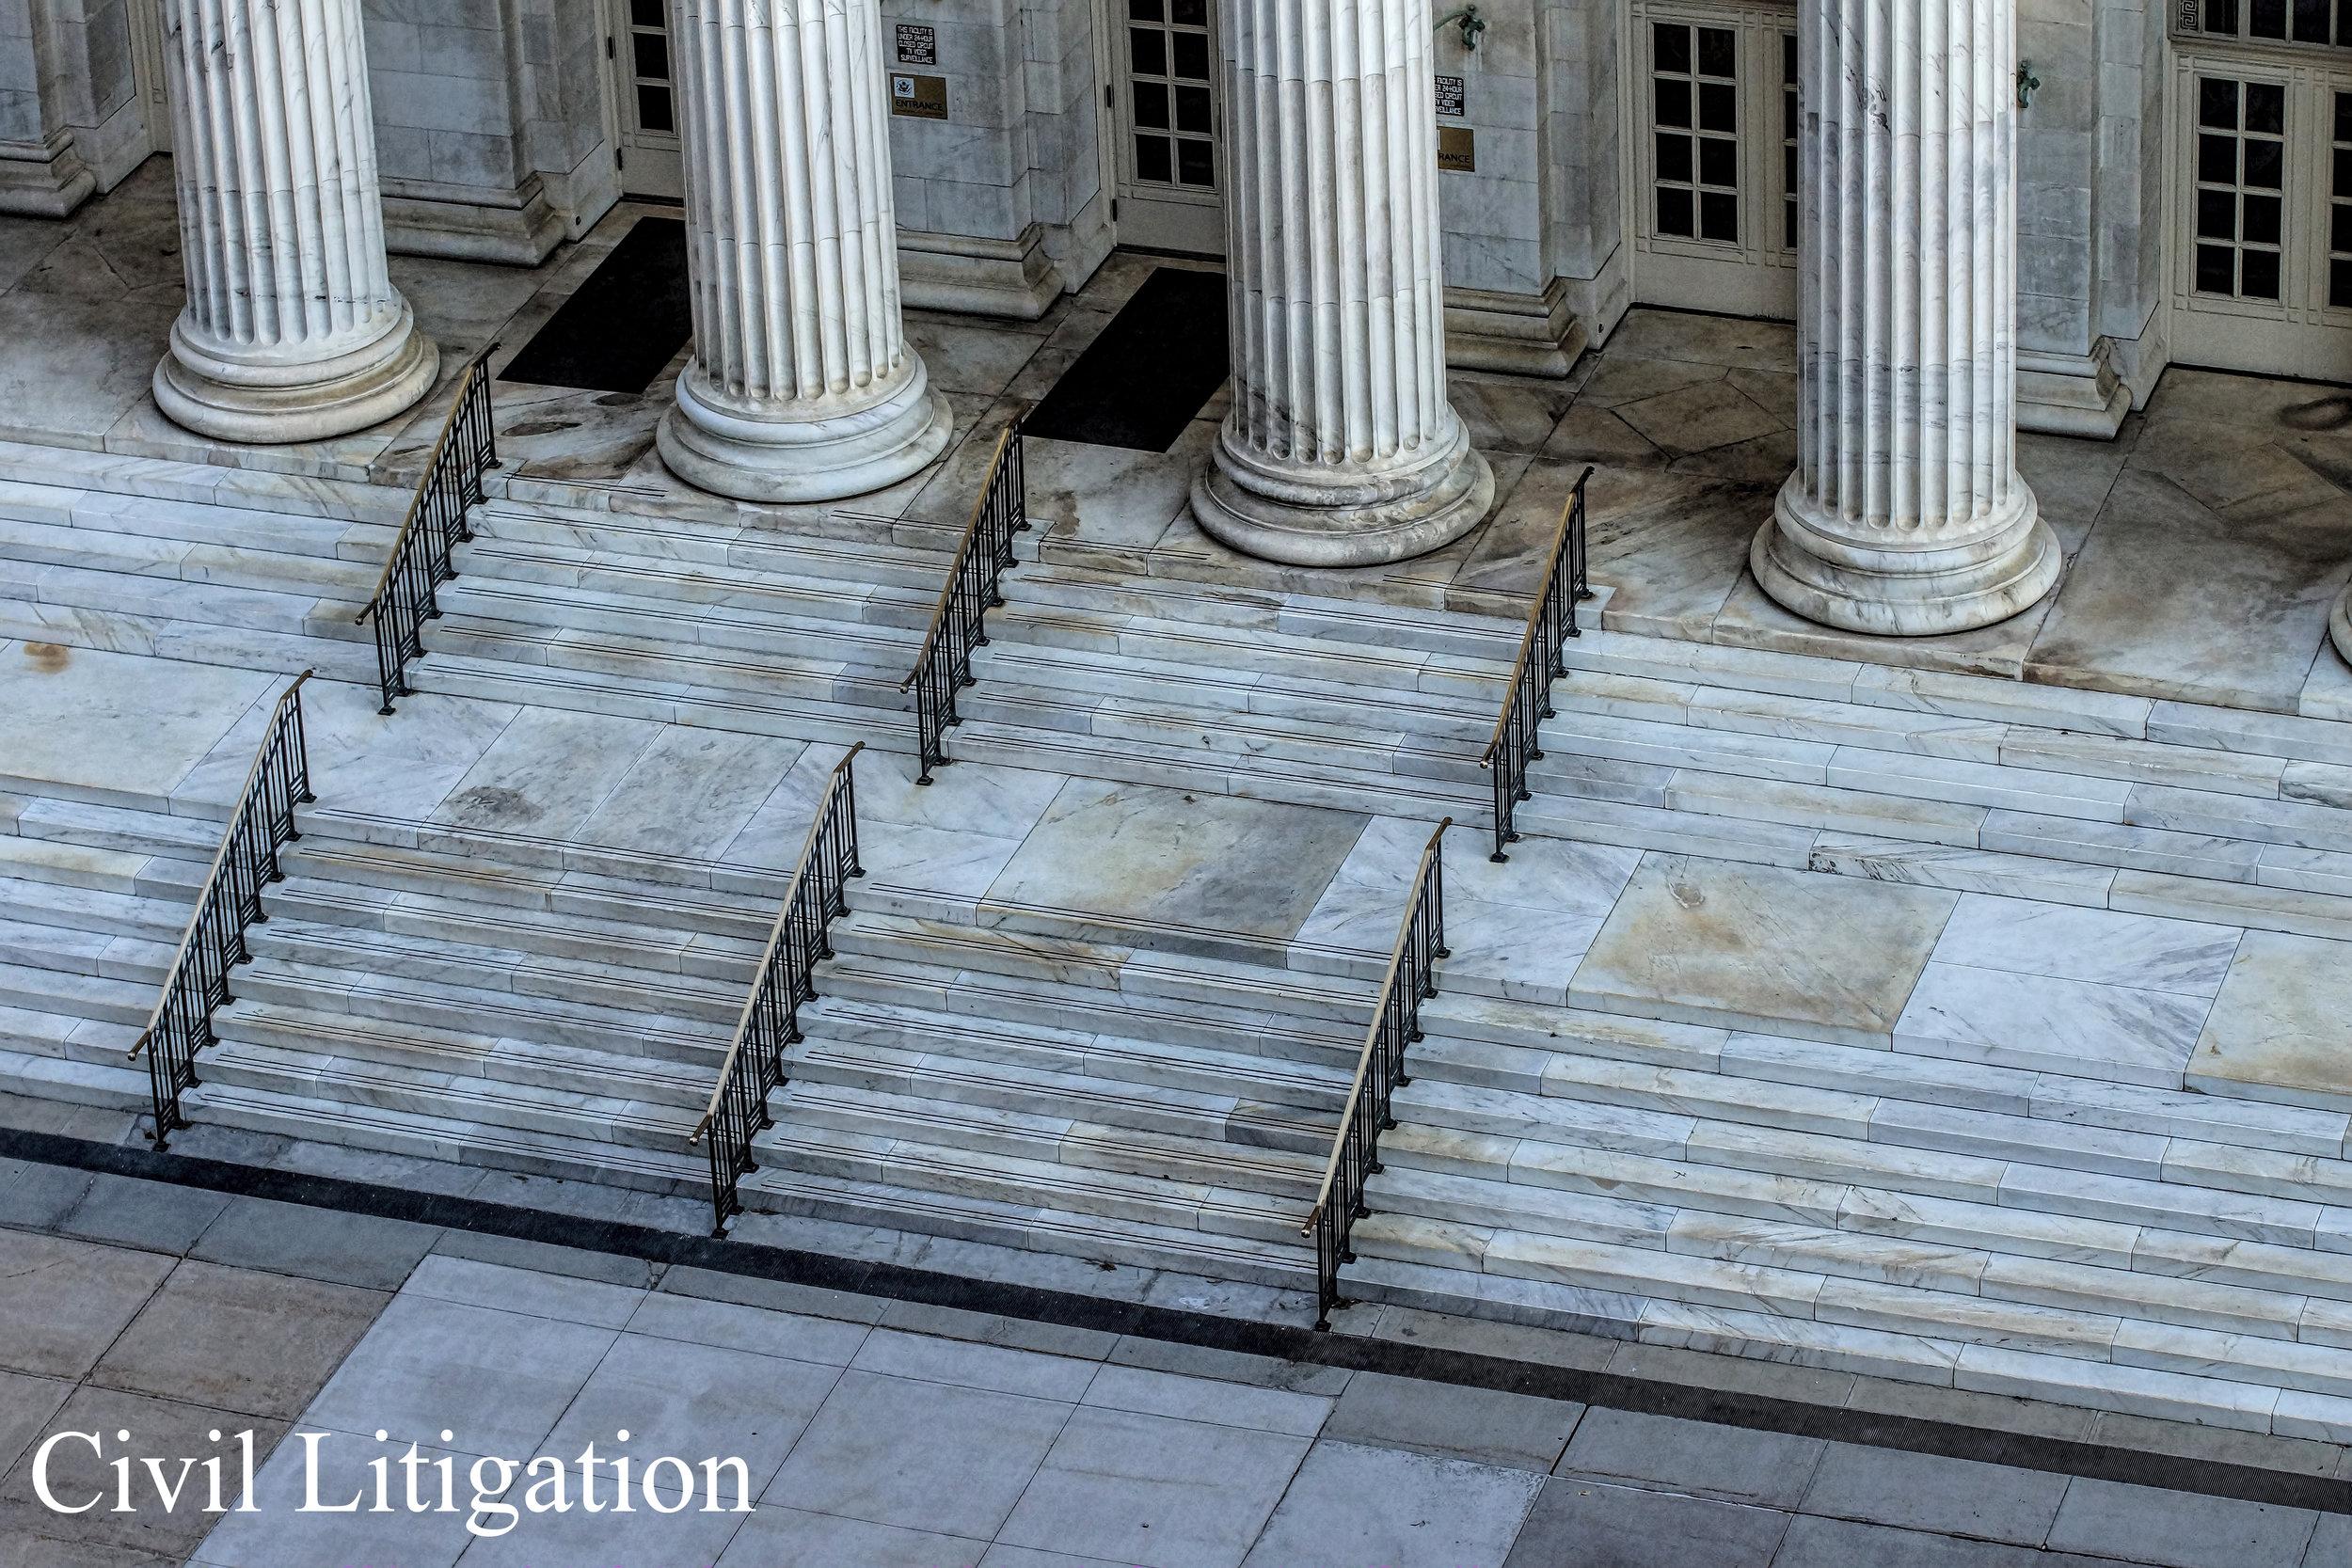 Civil Litigation copy.jpg